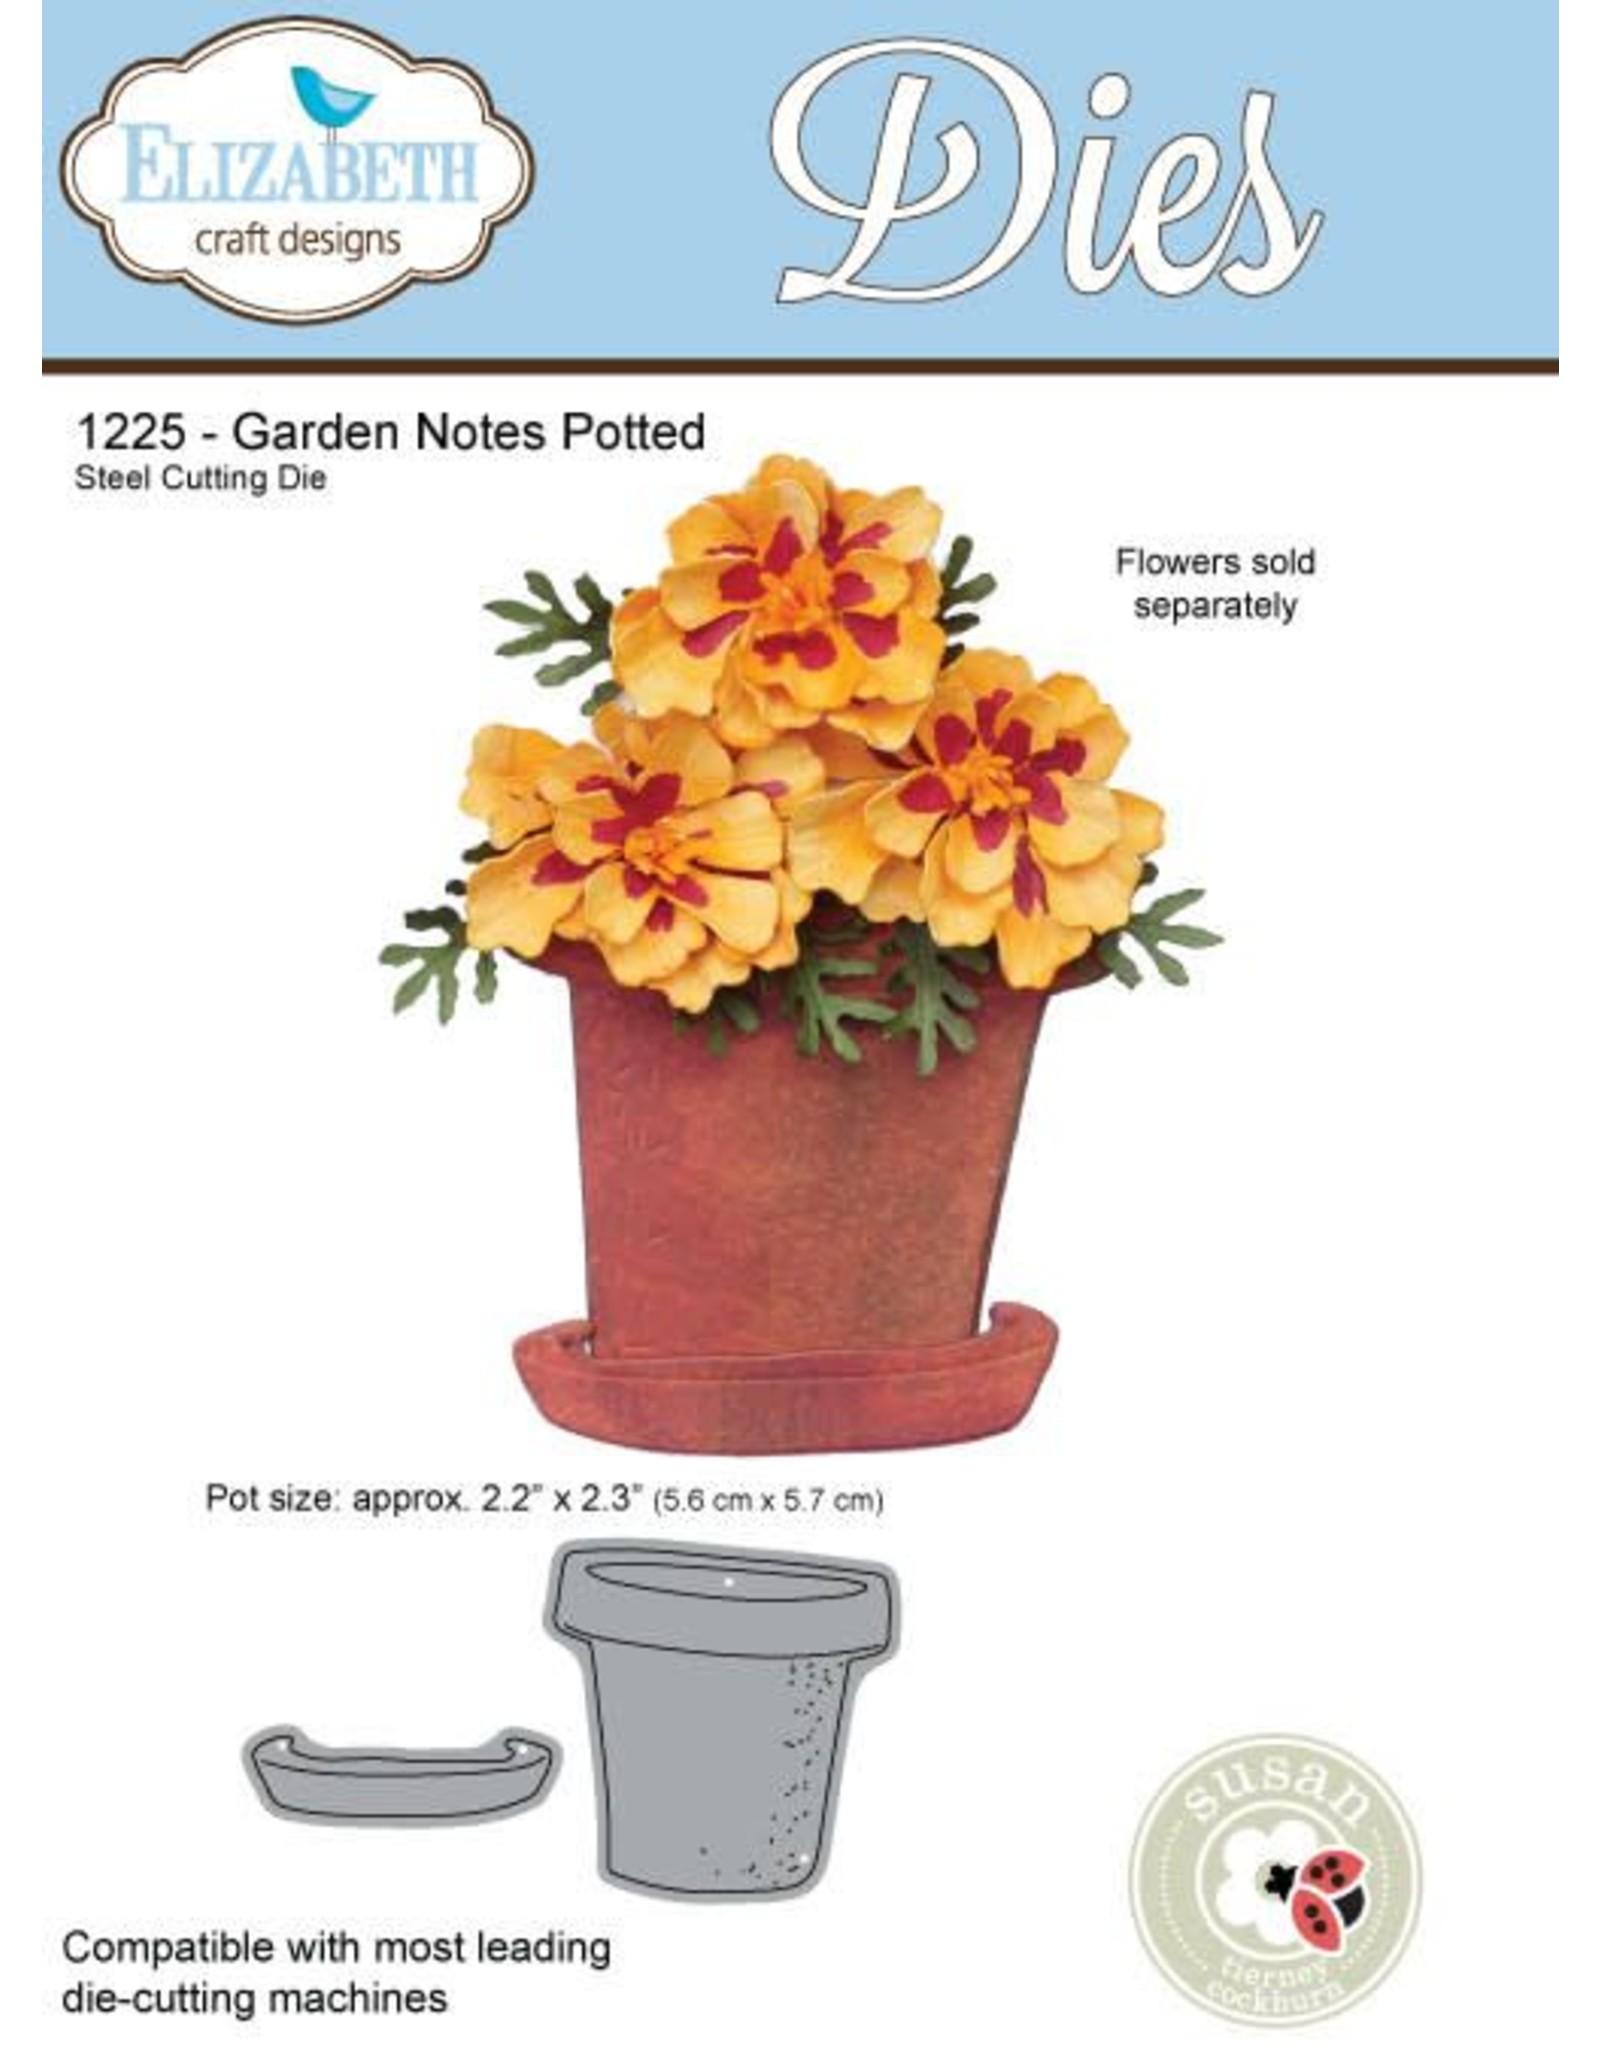 Elizabeth Craft Designs Elizabeth Craft Designs dies Garden Notes - Potted 1225